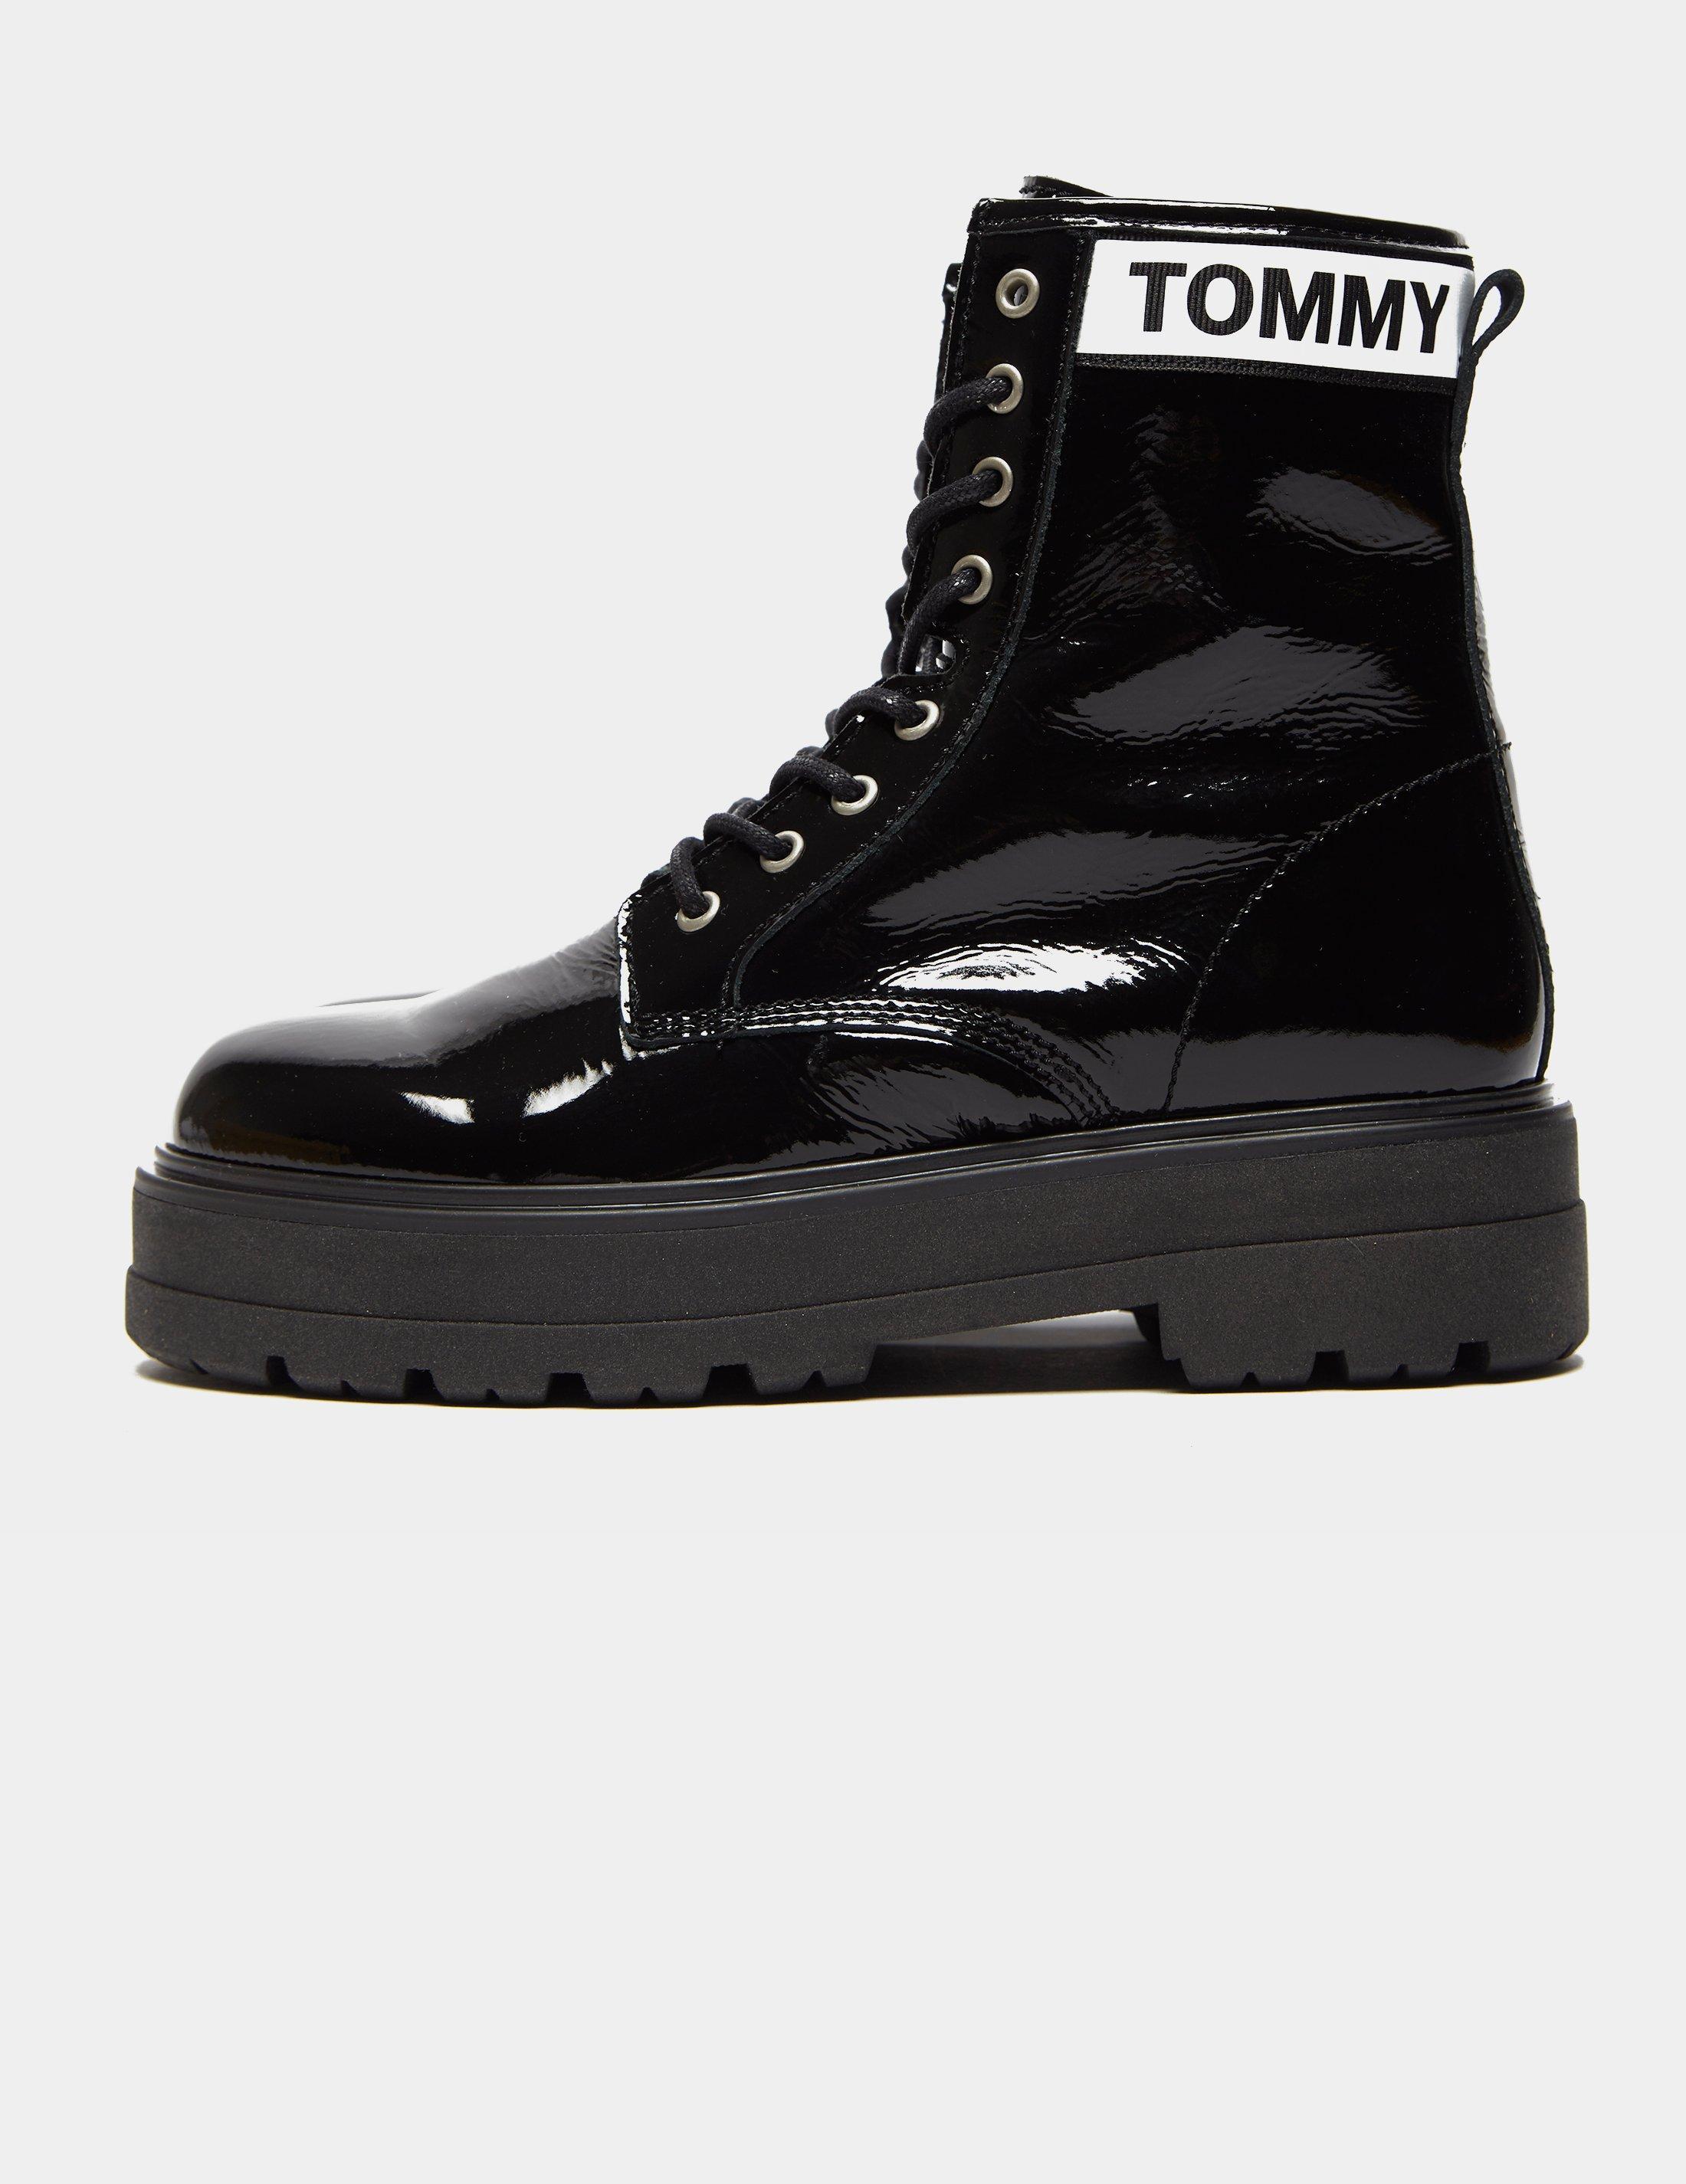 Tommy Hilfiger Leather Patent Platform